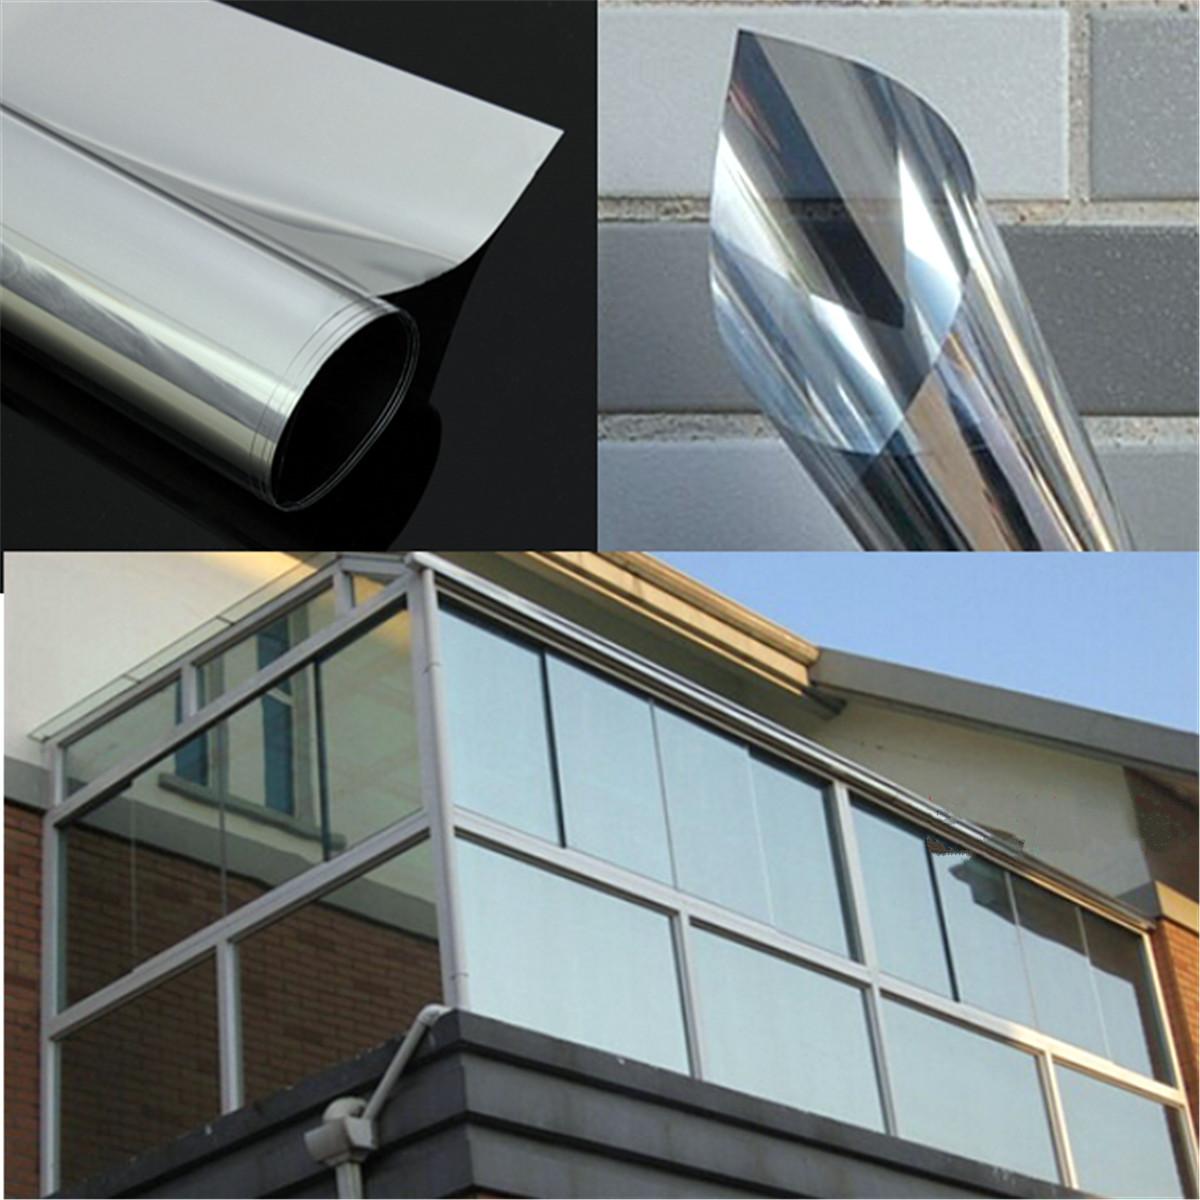 1pc mirror silver solar reflective window film one way privacy tint 50cm x 1m ebay. Black Bedroom Furniture Sets. Home Design Ideas